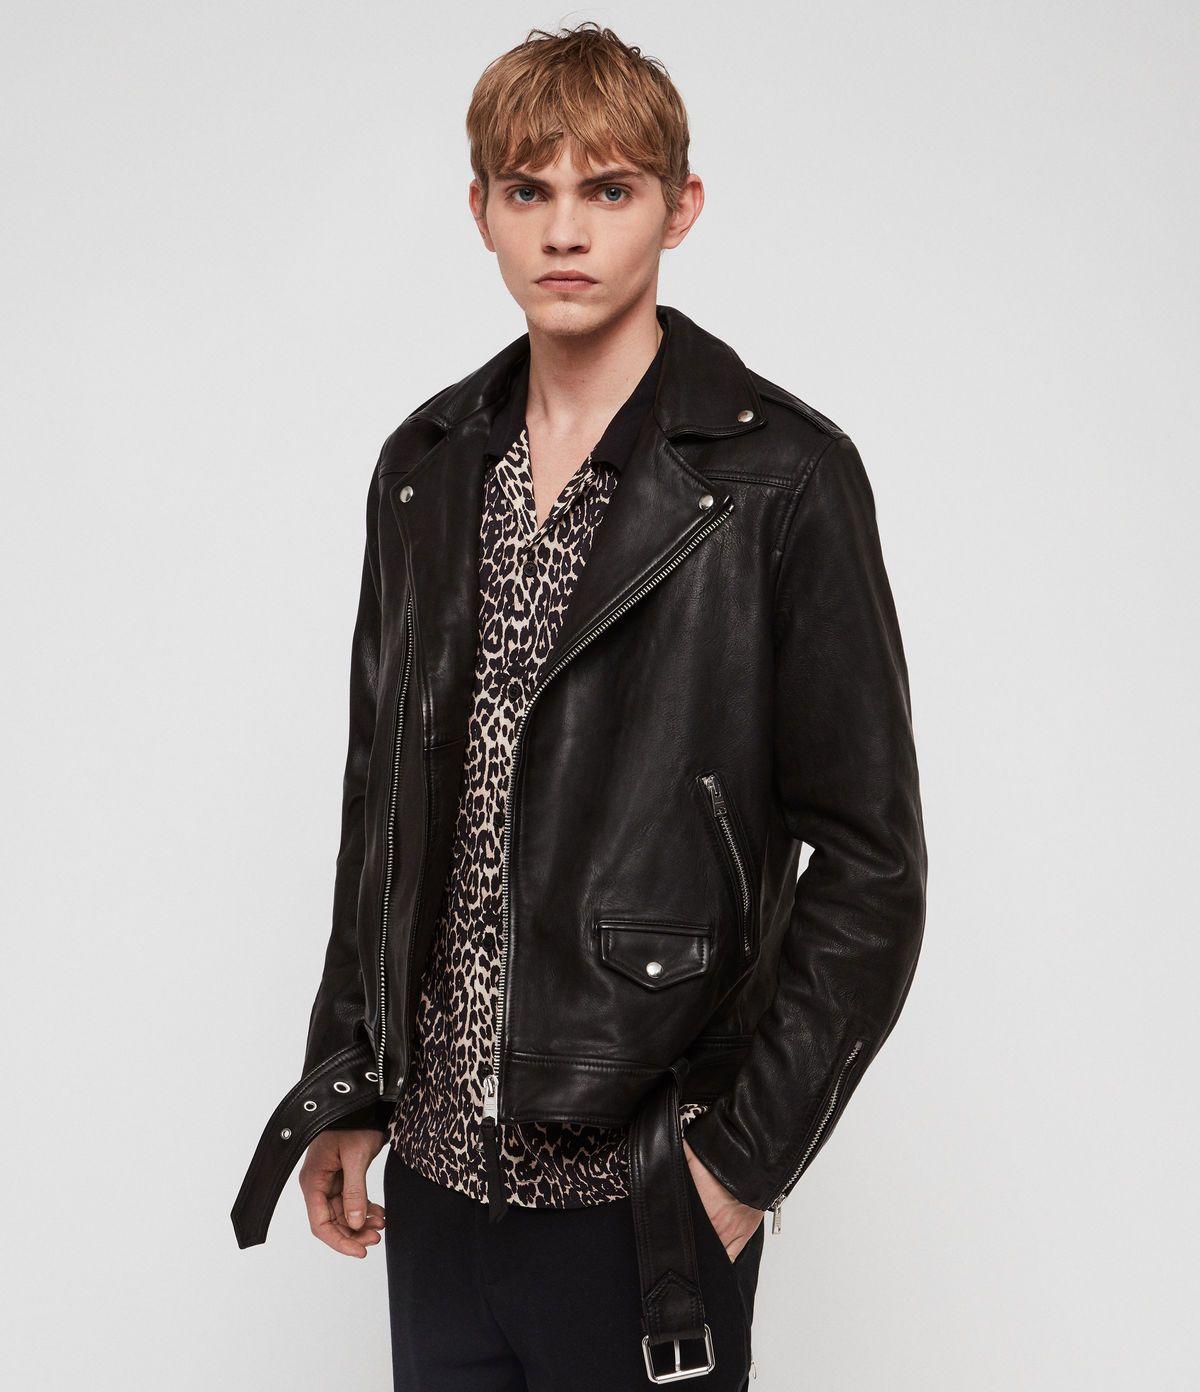 Allsaints Us Mens Manor Leather Biker Jacket Black Leather Jeans Men Leather Jacket Details Leather Bomber Jacket [ 1392 x 1200 Pixel ]